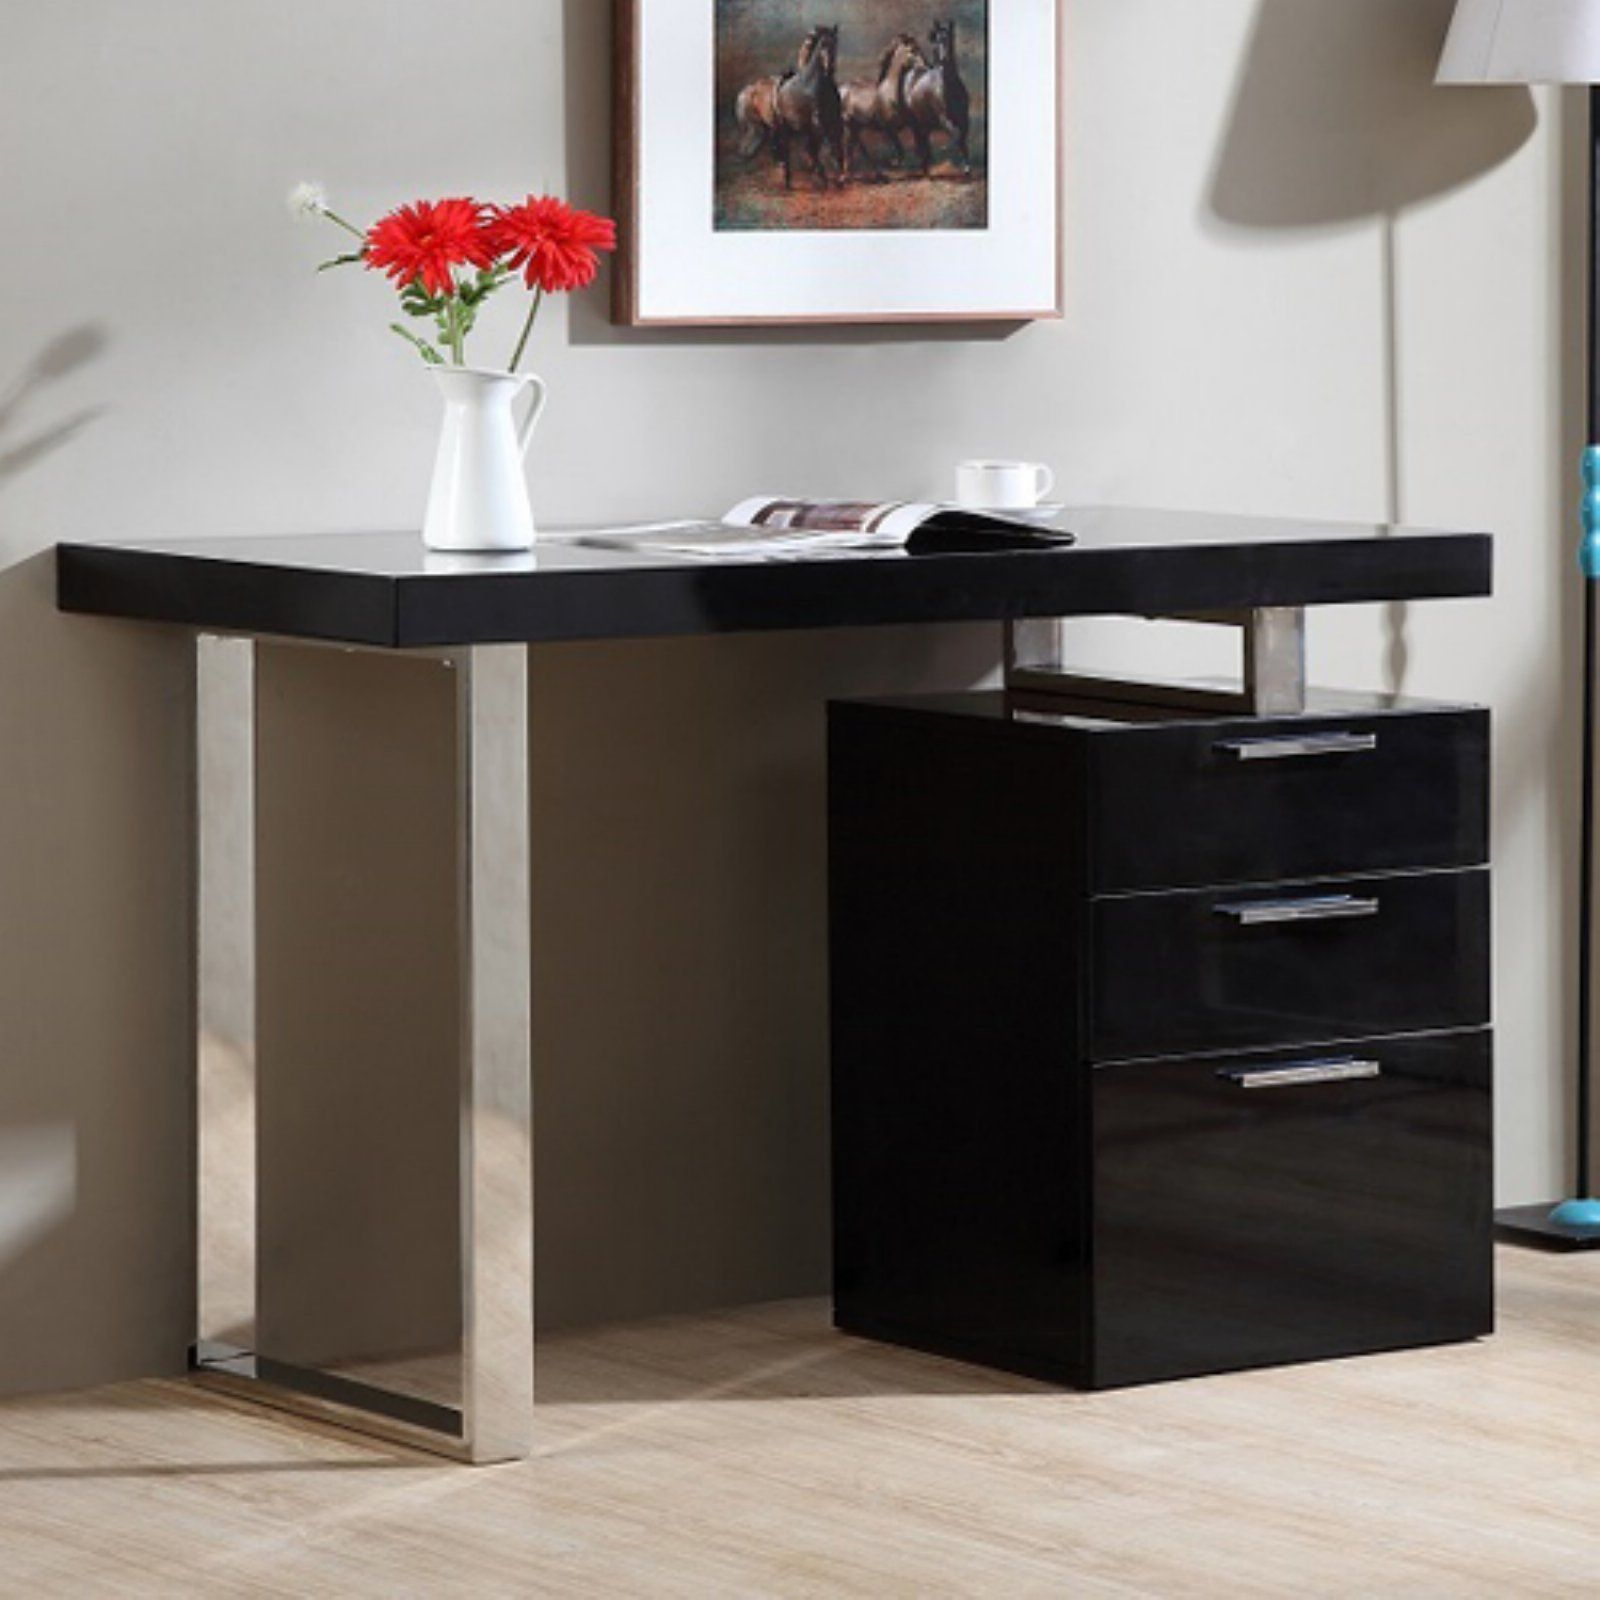 J&M Furniture CE Geneva Writing/Laptop Desk | Products in